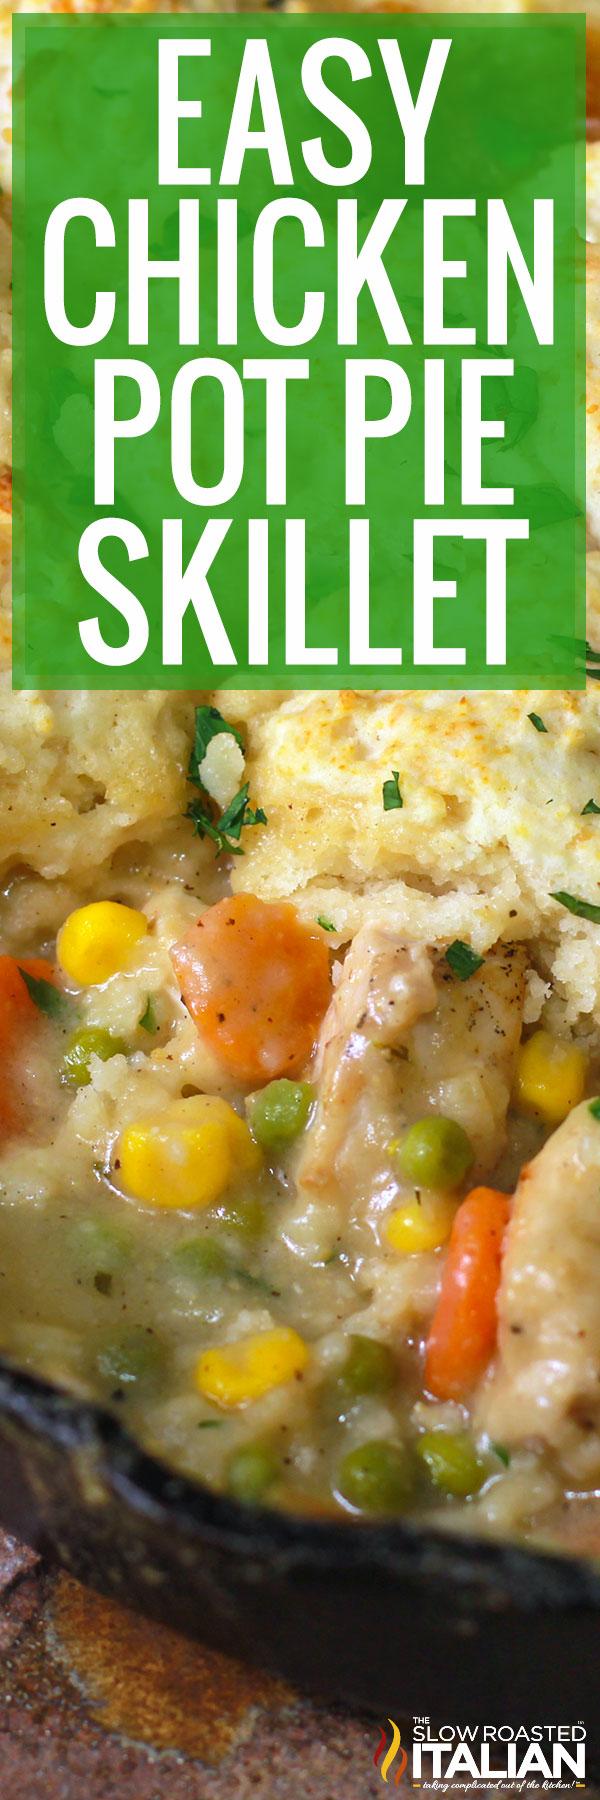 Title text (shown in a skillet): Easy Chicken Pot Pie Skillet Recipe